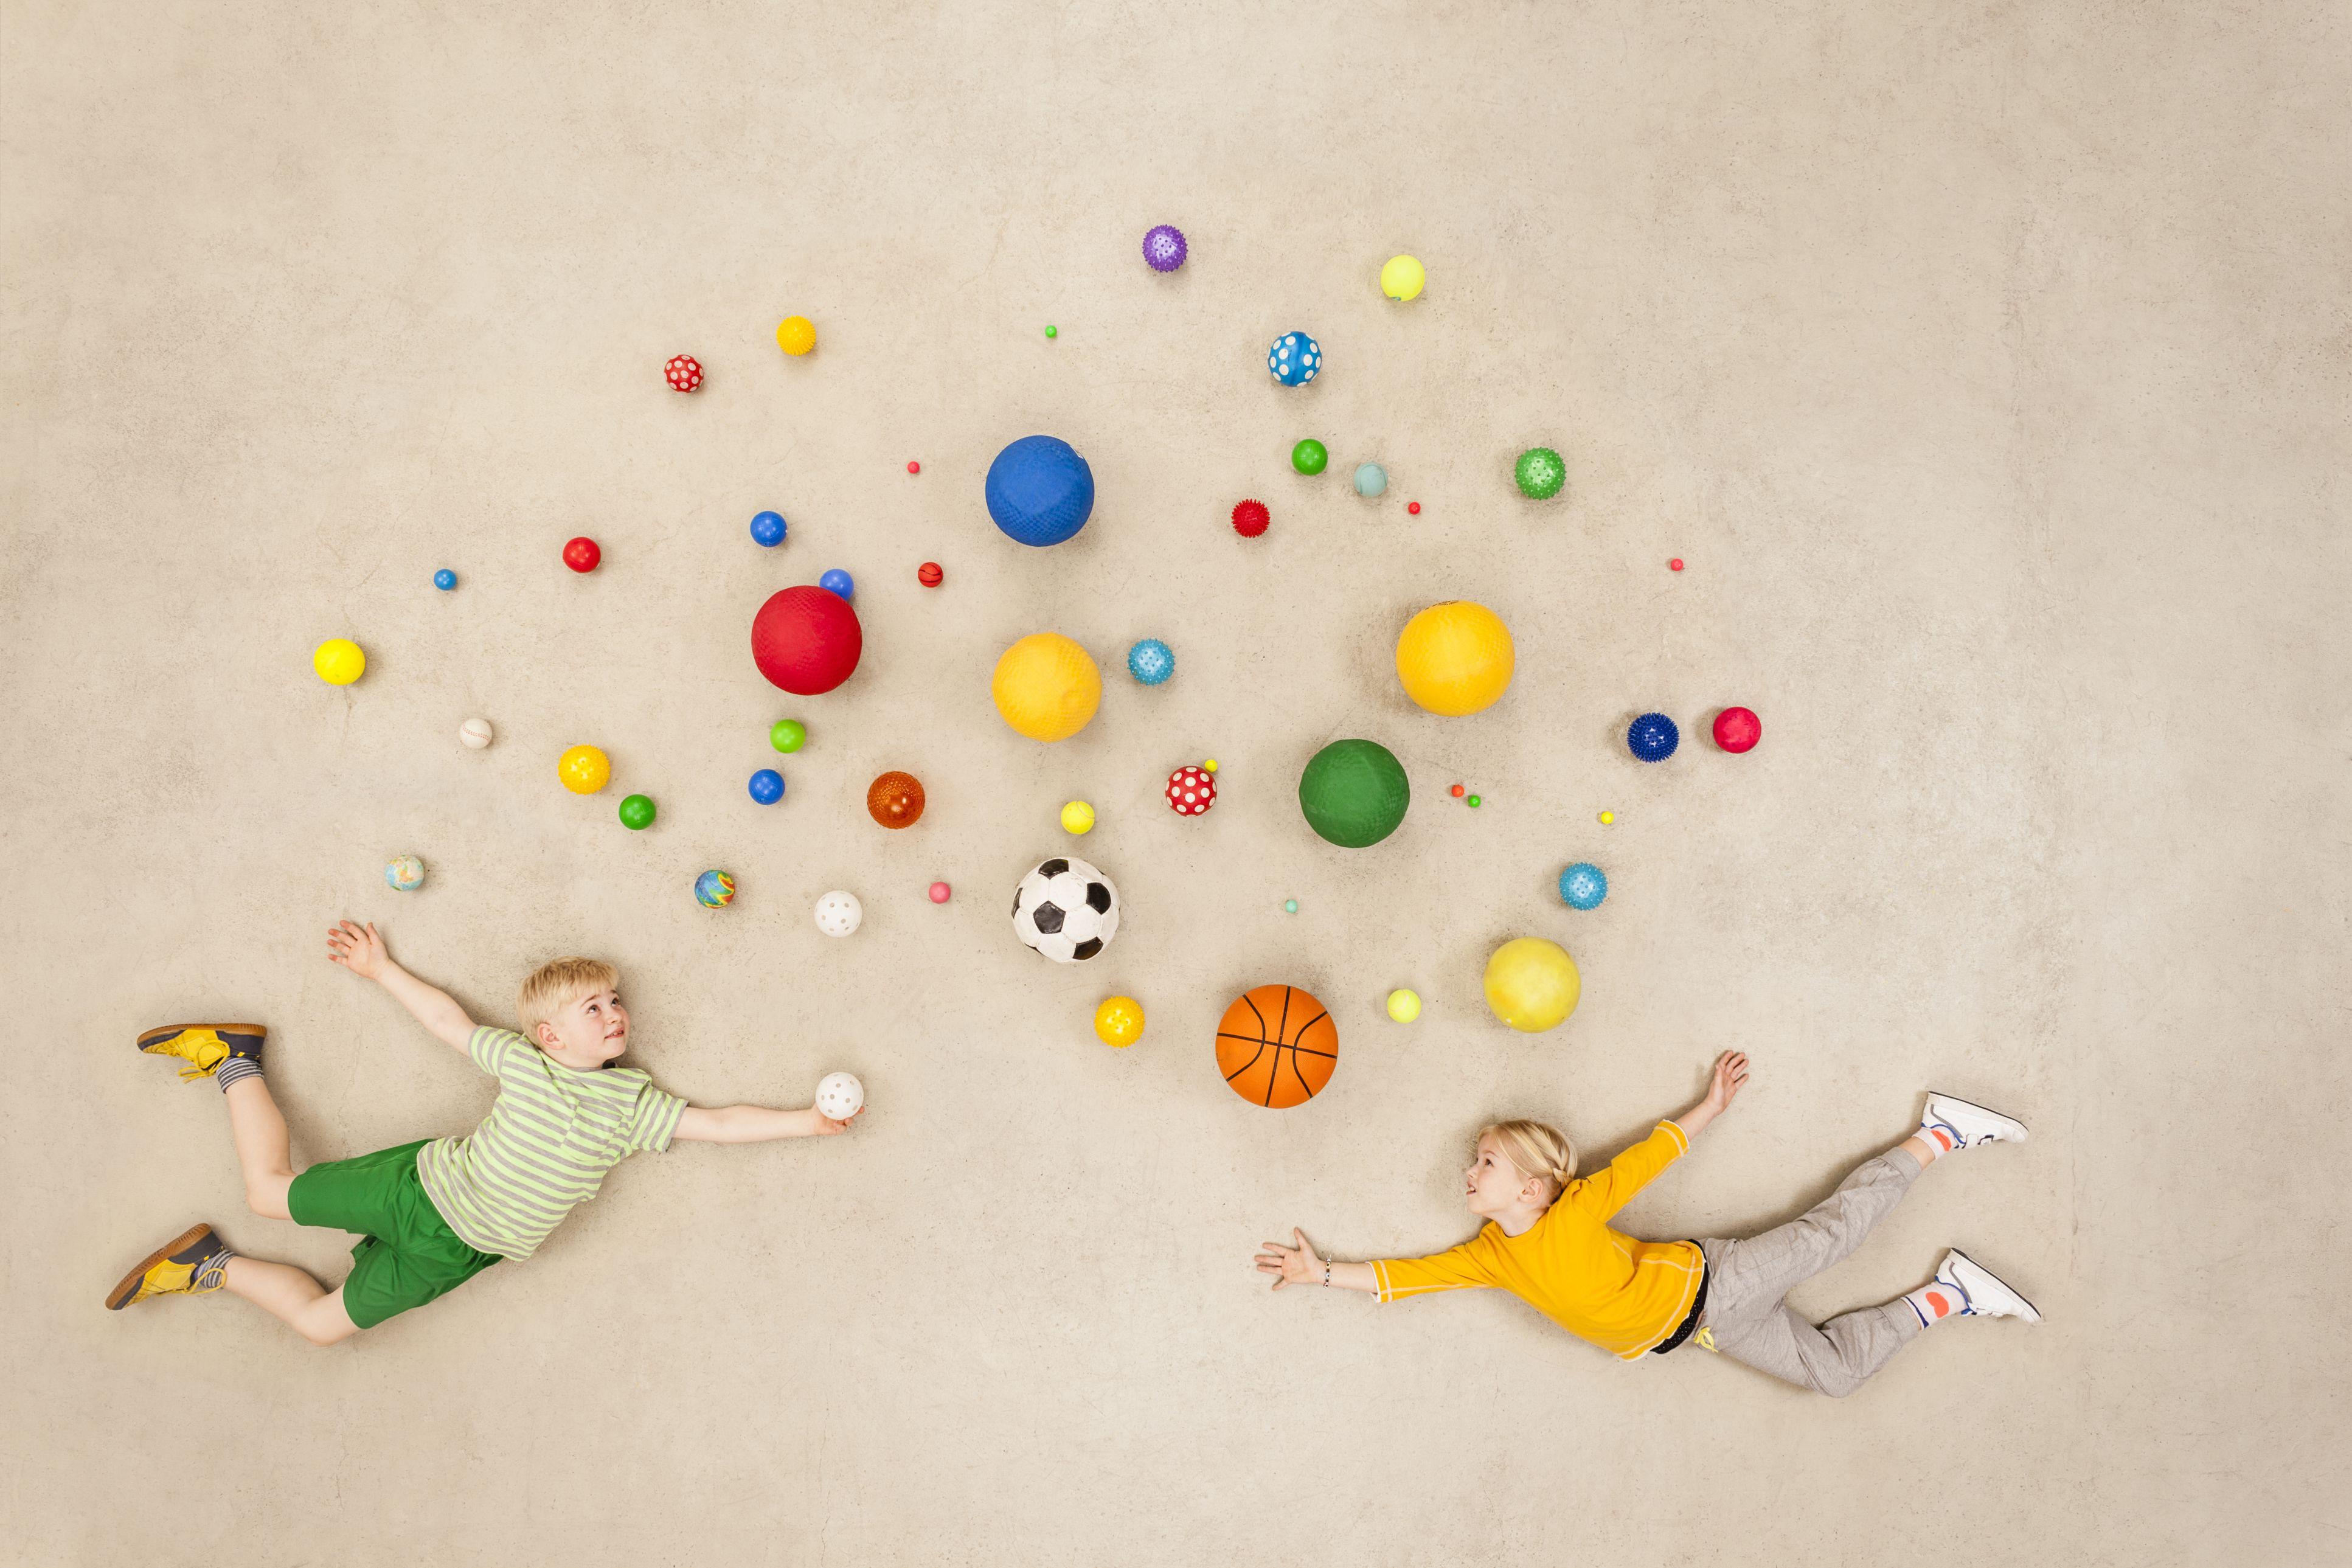 12 Best Easter Toys for Kids